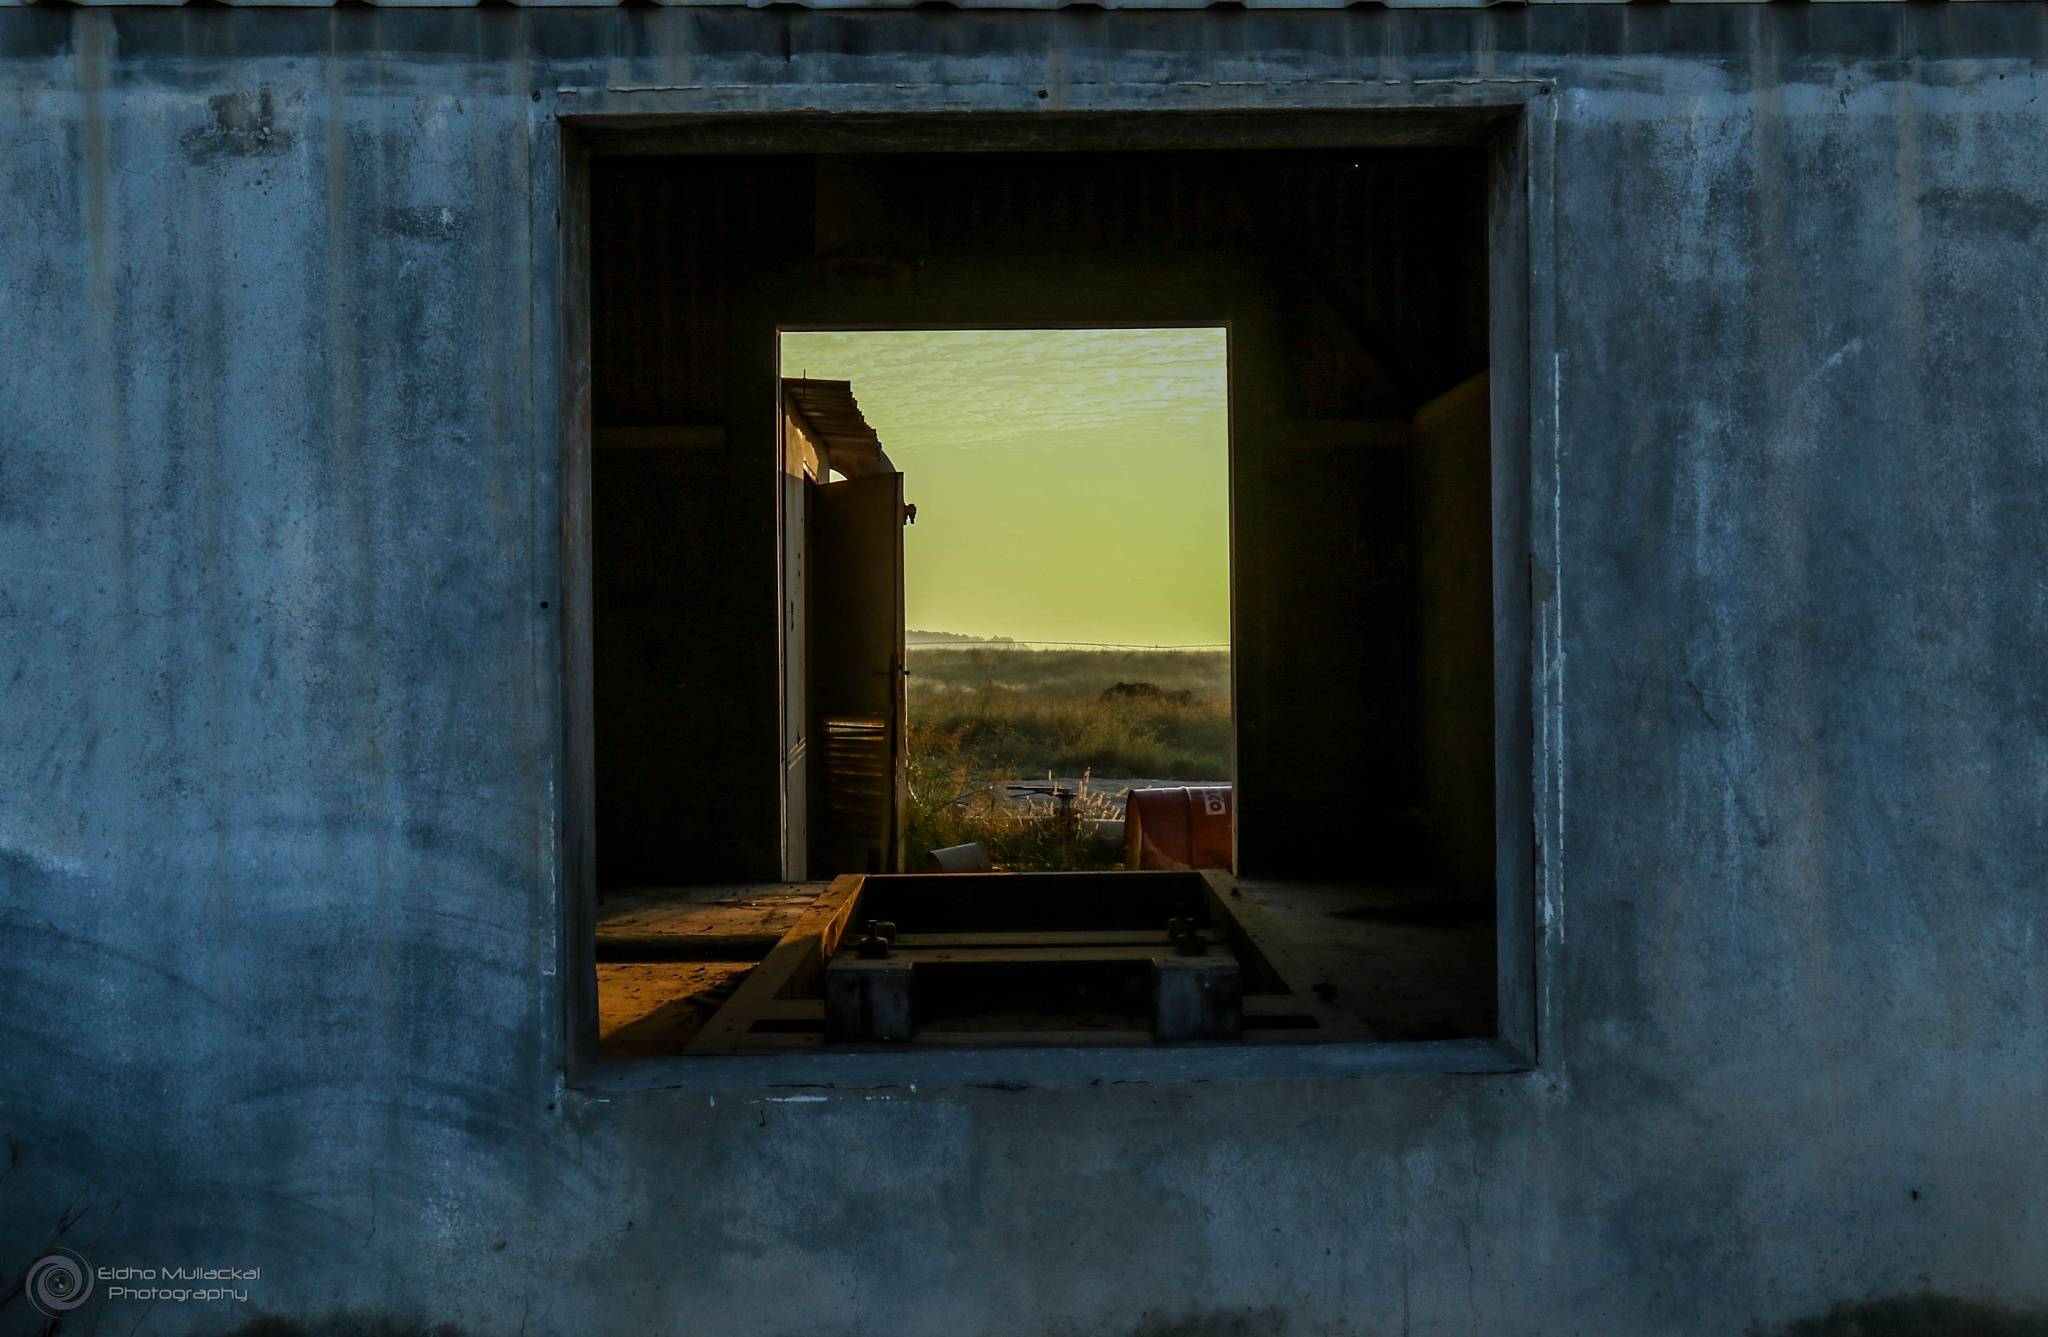 frames by Eldho Joseph